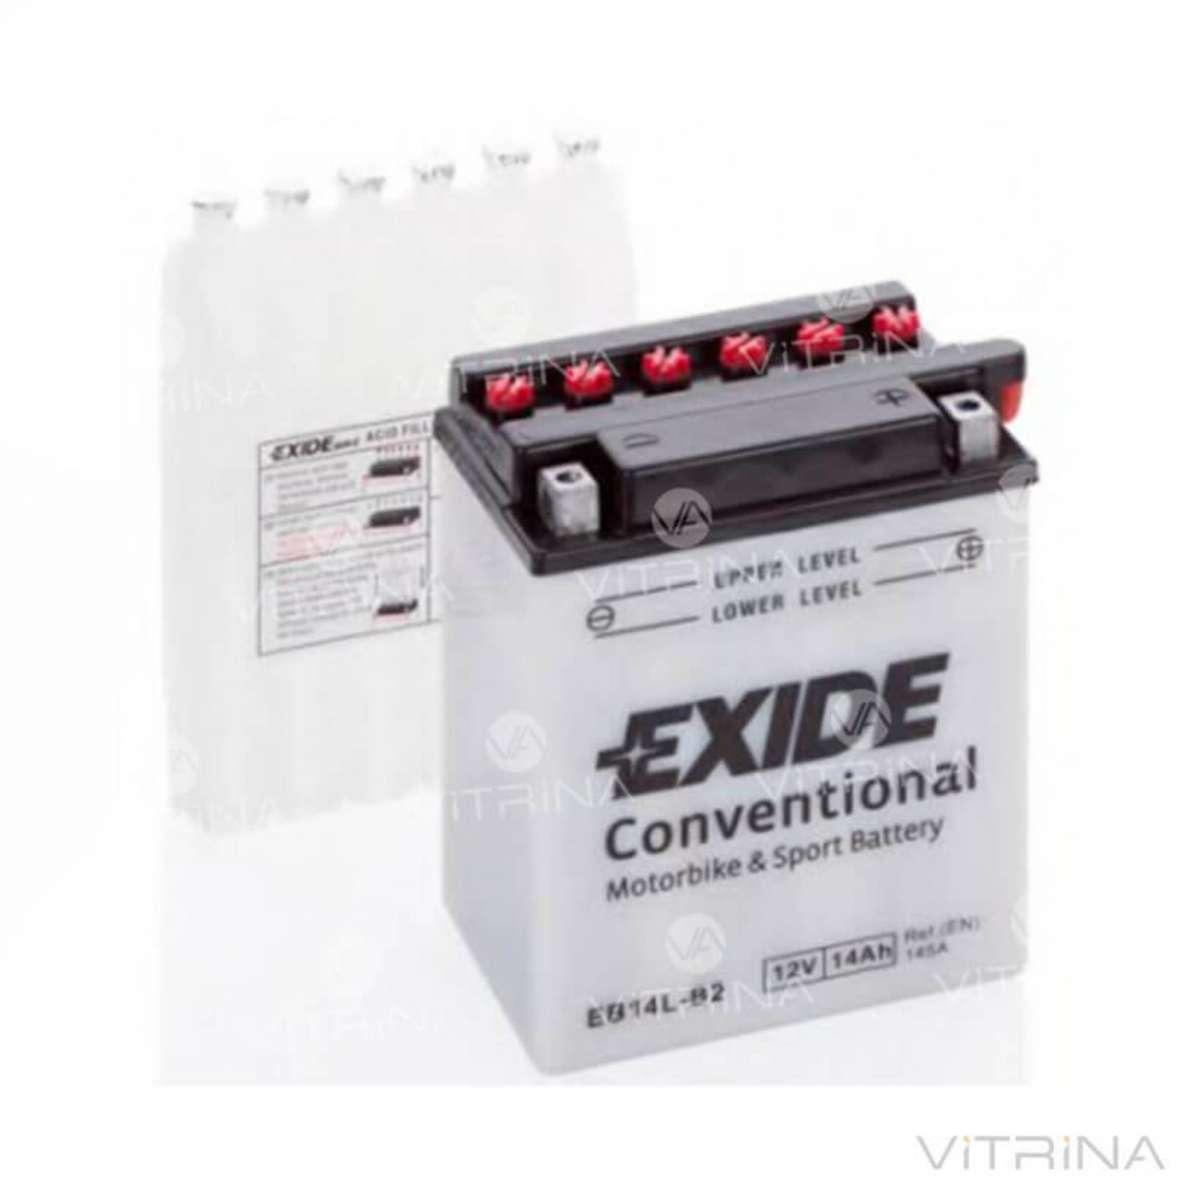 Аккумулятор EXIDE 14Ah-12v EB14L-B2 134х89х166 | R, EN145 Европа